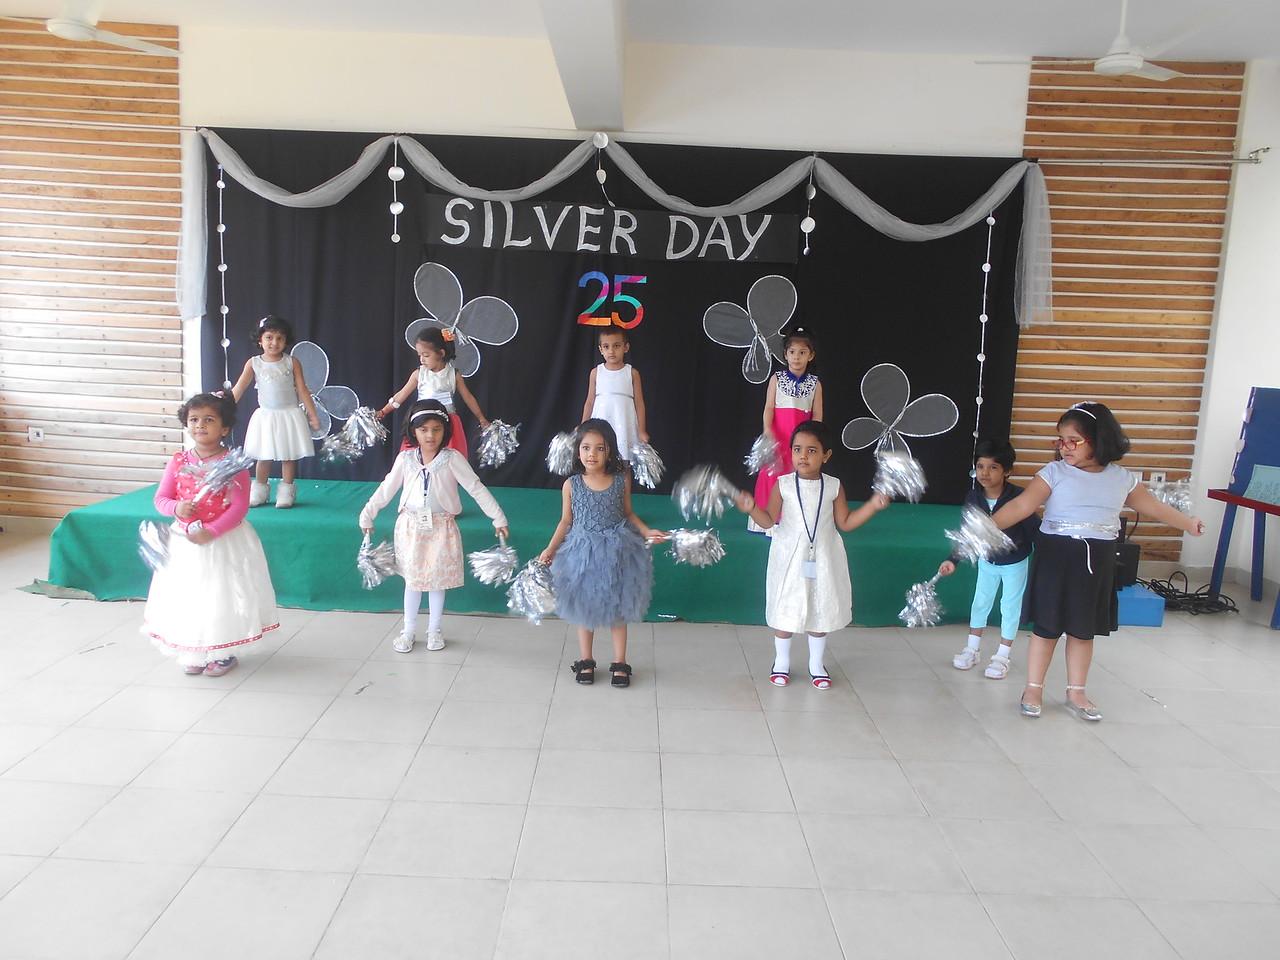 Fun at Silver Day